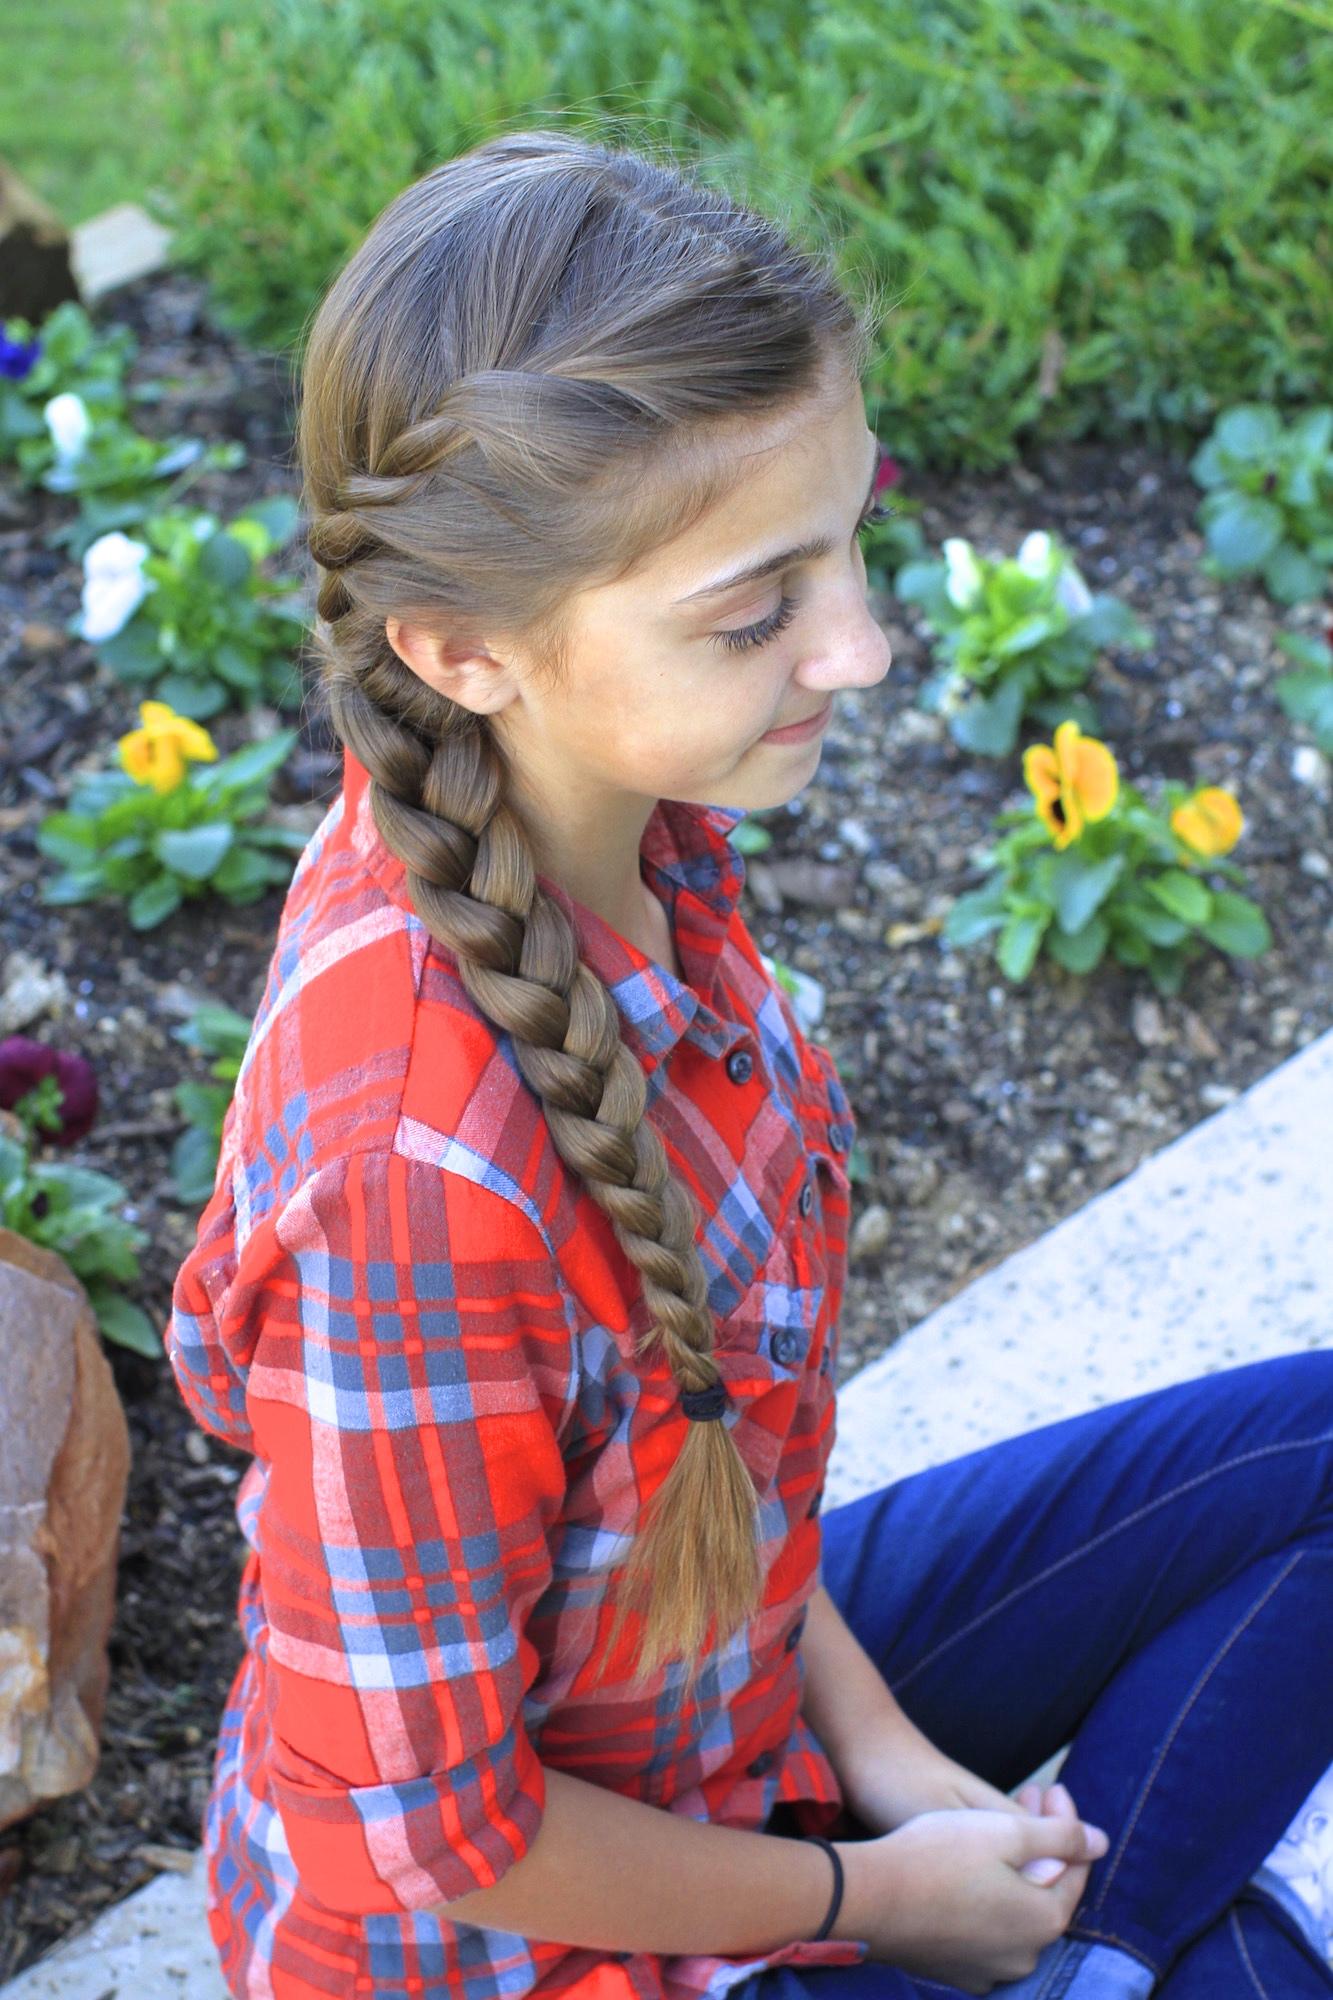 French Twist into Side Braid - Cute Girls Hairstyles